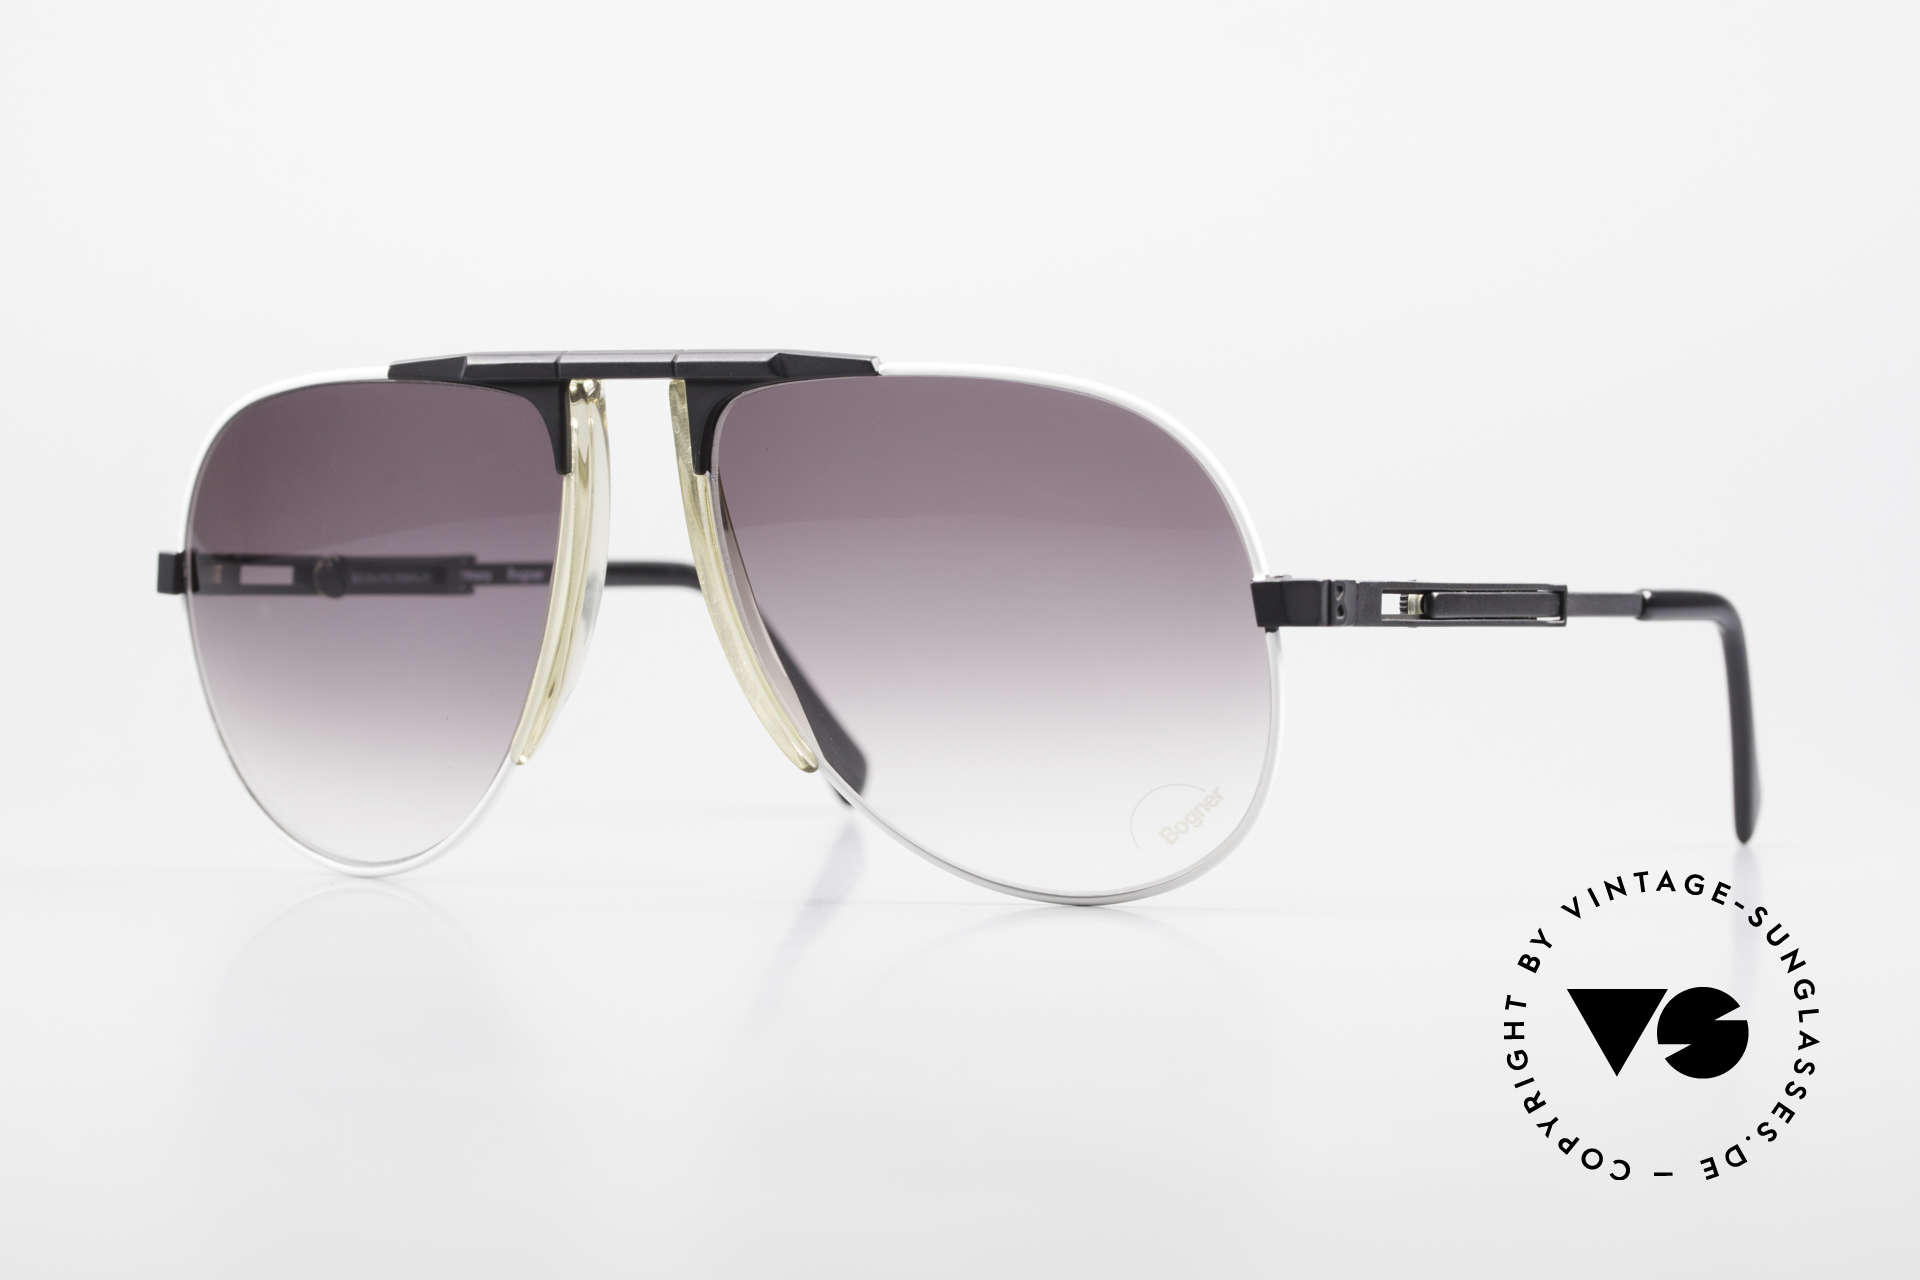 Willy Bogner 7011 Men 80's Sunglasses Adjustable, vintage sports sunglasses by skiing-ace Willy BOGNER, Made for Men